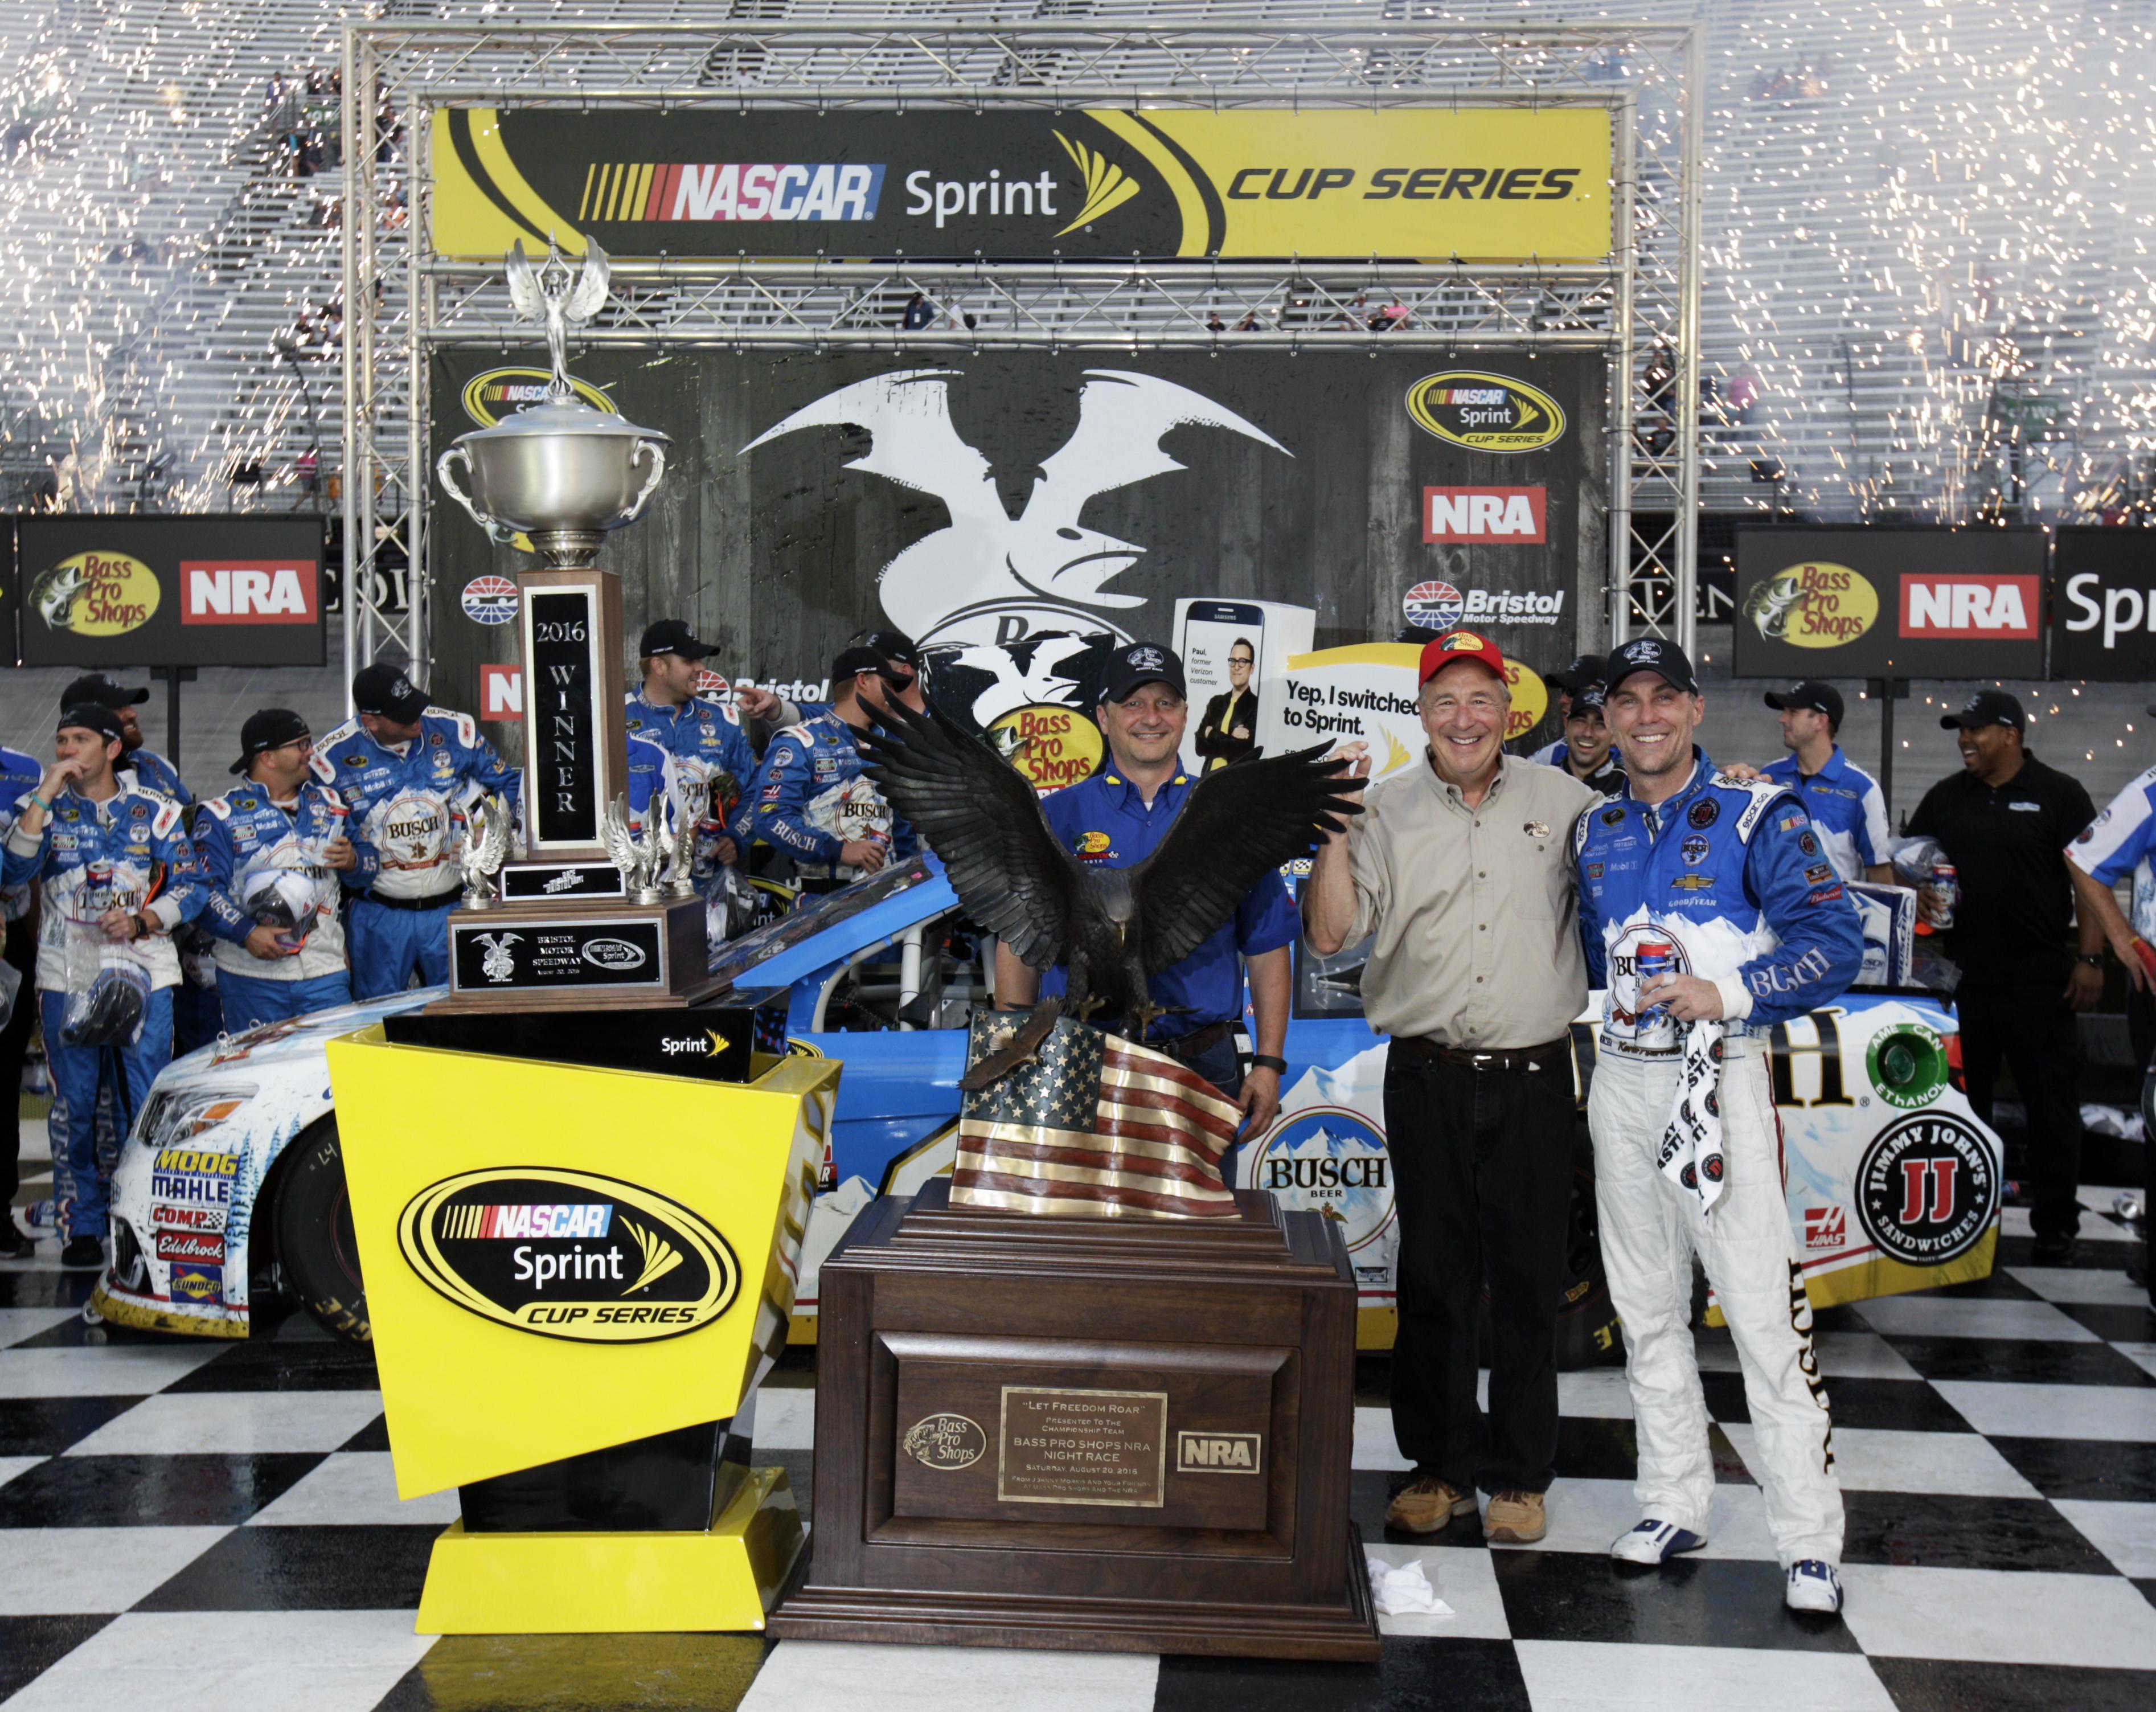 NASCAR_Bristol_Auto_Racing.JPG